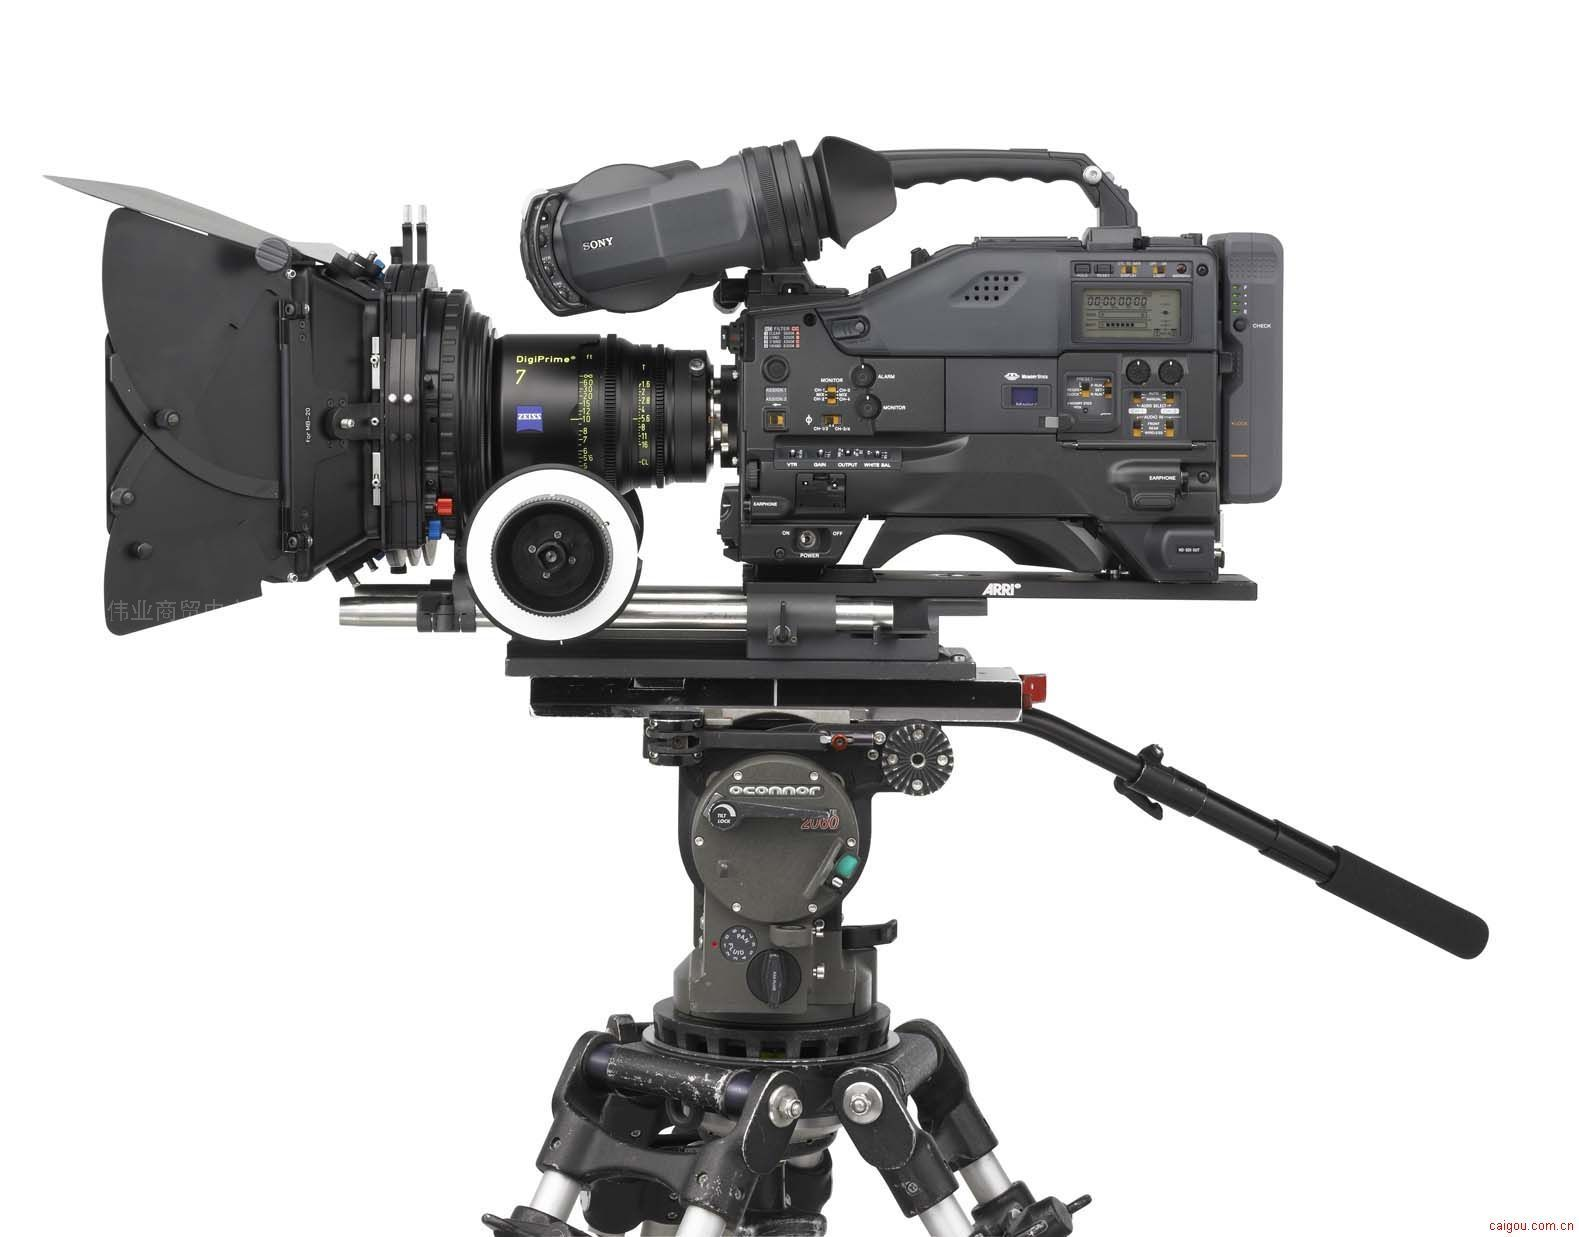 索尼HDW-F900R 摄像机